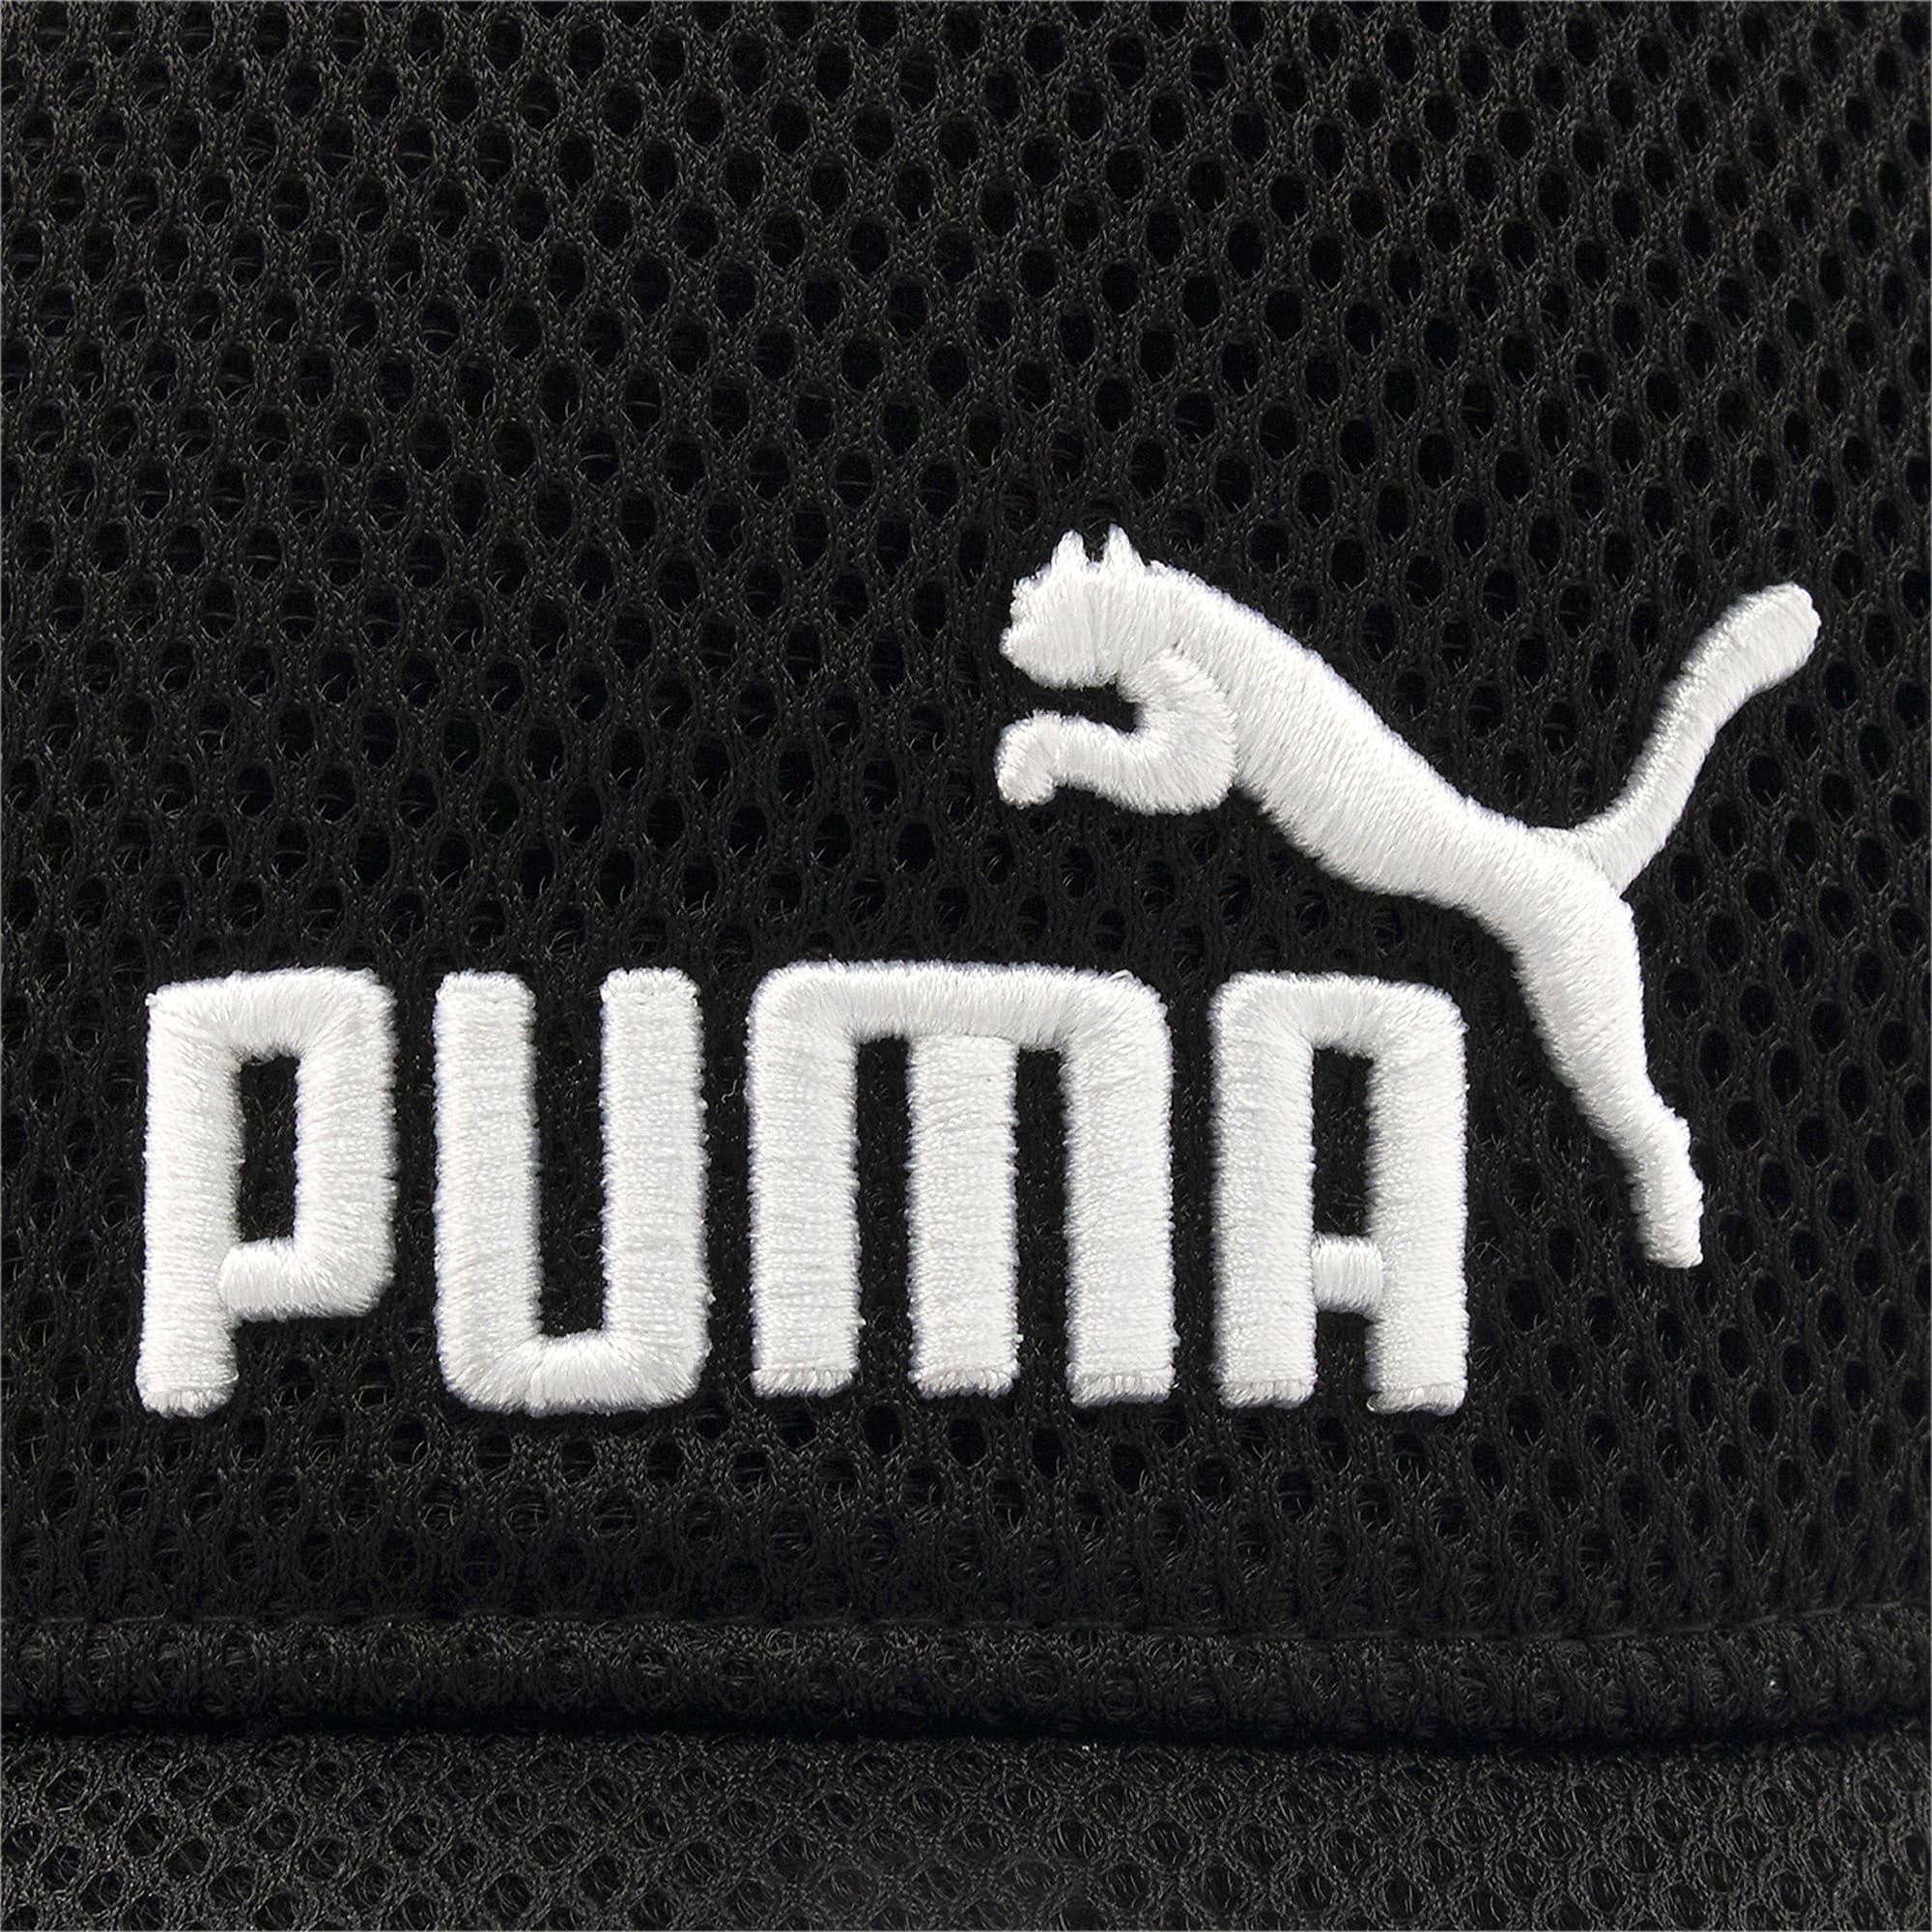 Thumbnail 6 of キッズ トレーニング メッシュ キャップ JR, Puma Black-No 1, medium-JPN